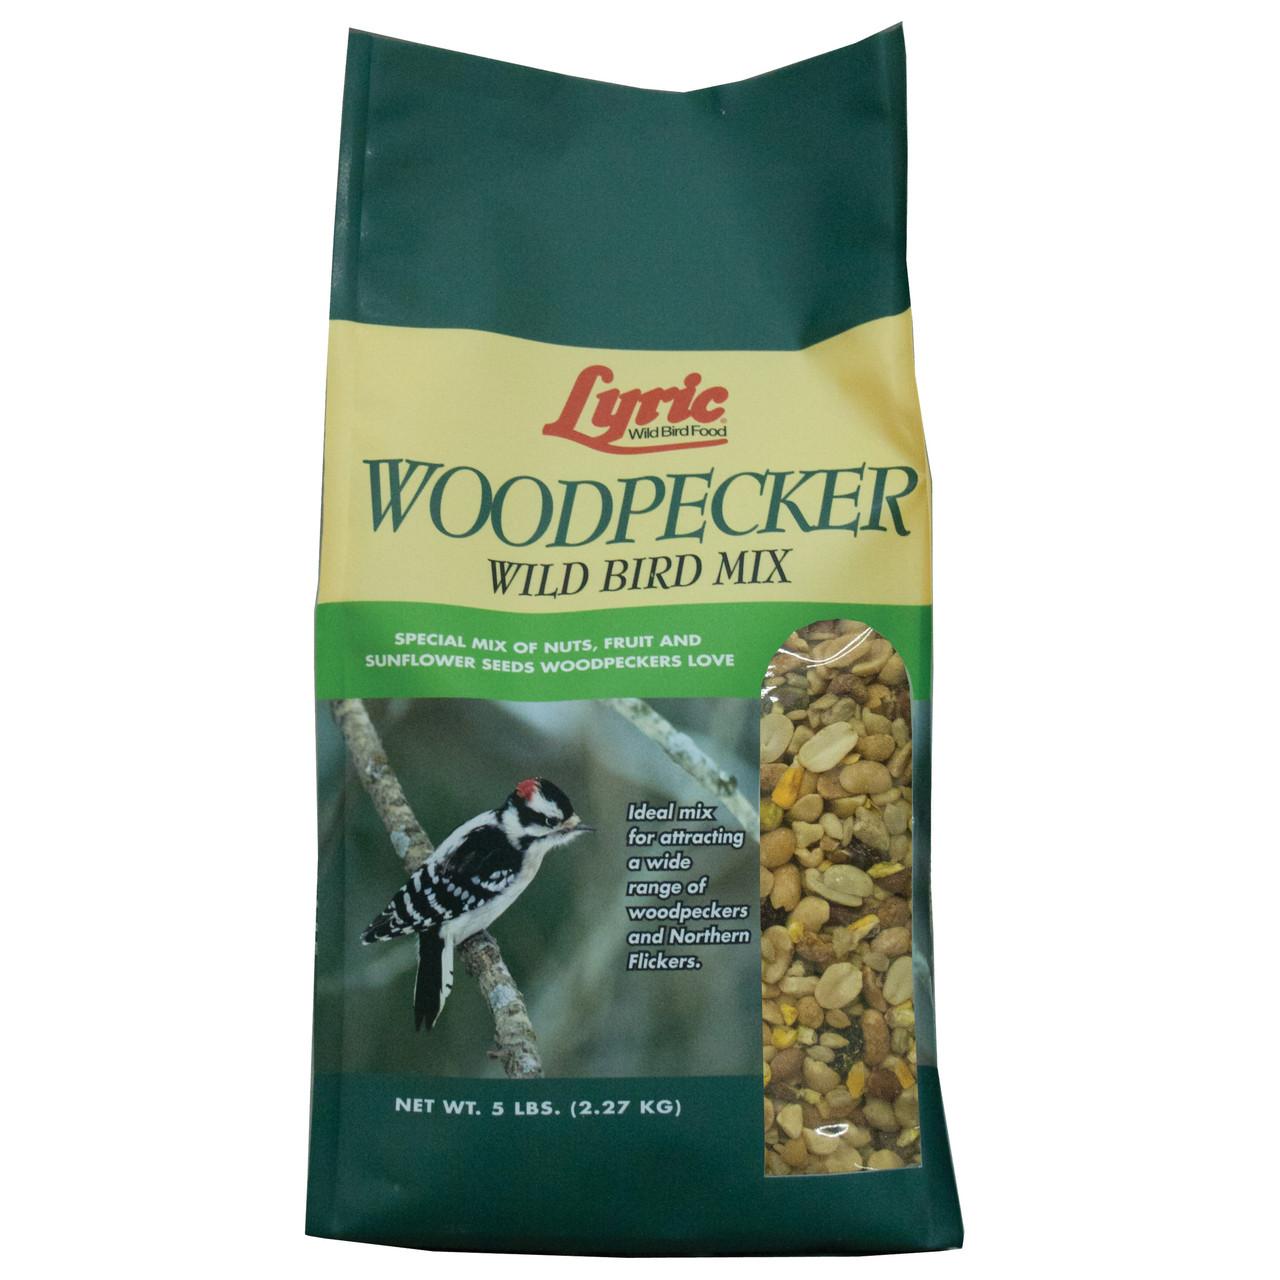 Lyric-5lb-Woodpecker-Bird-Food-Cube-Green